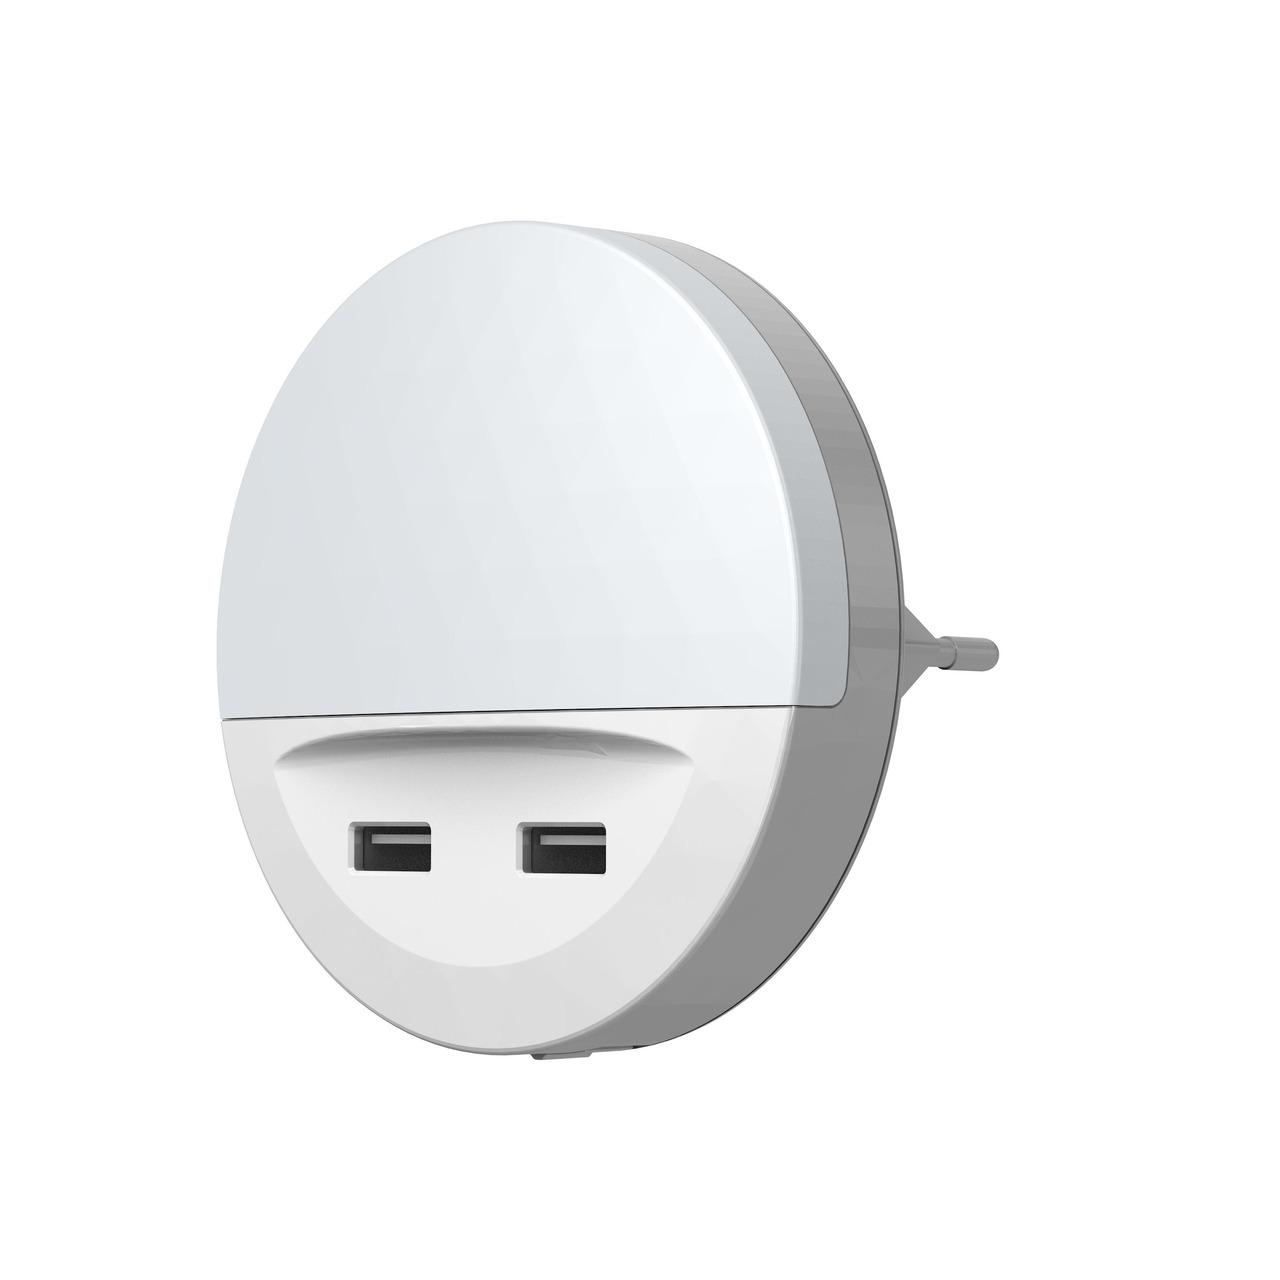 Ledvance Sockel-Nachtlicht LUNETTA USB- mit USB-Ausgängen- Tag-Nachtsensor- IP20